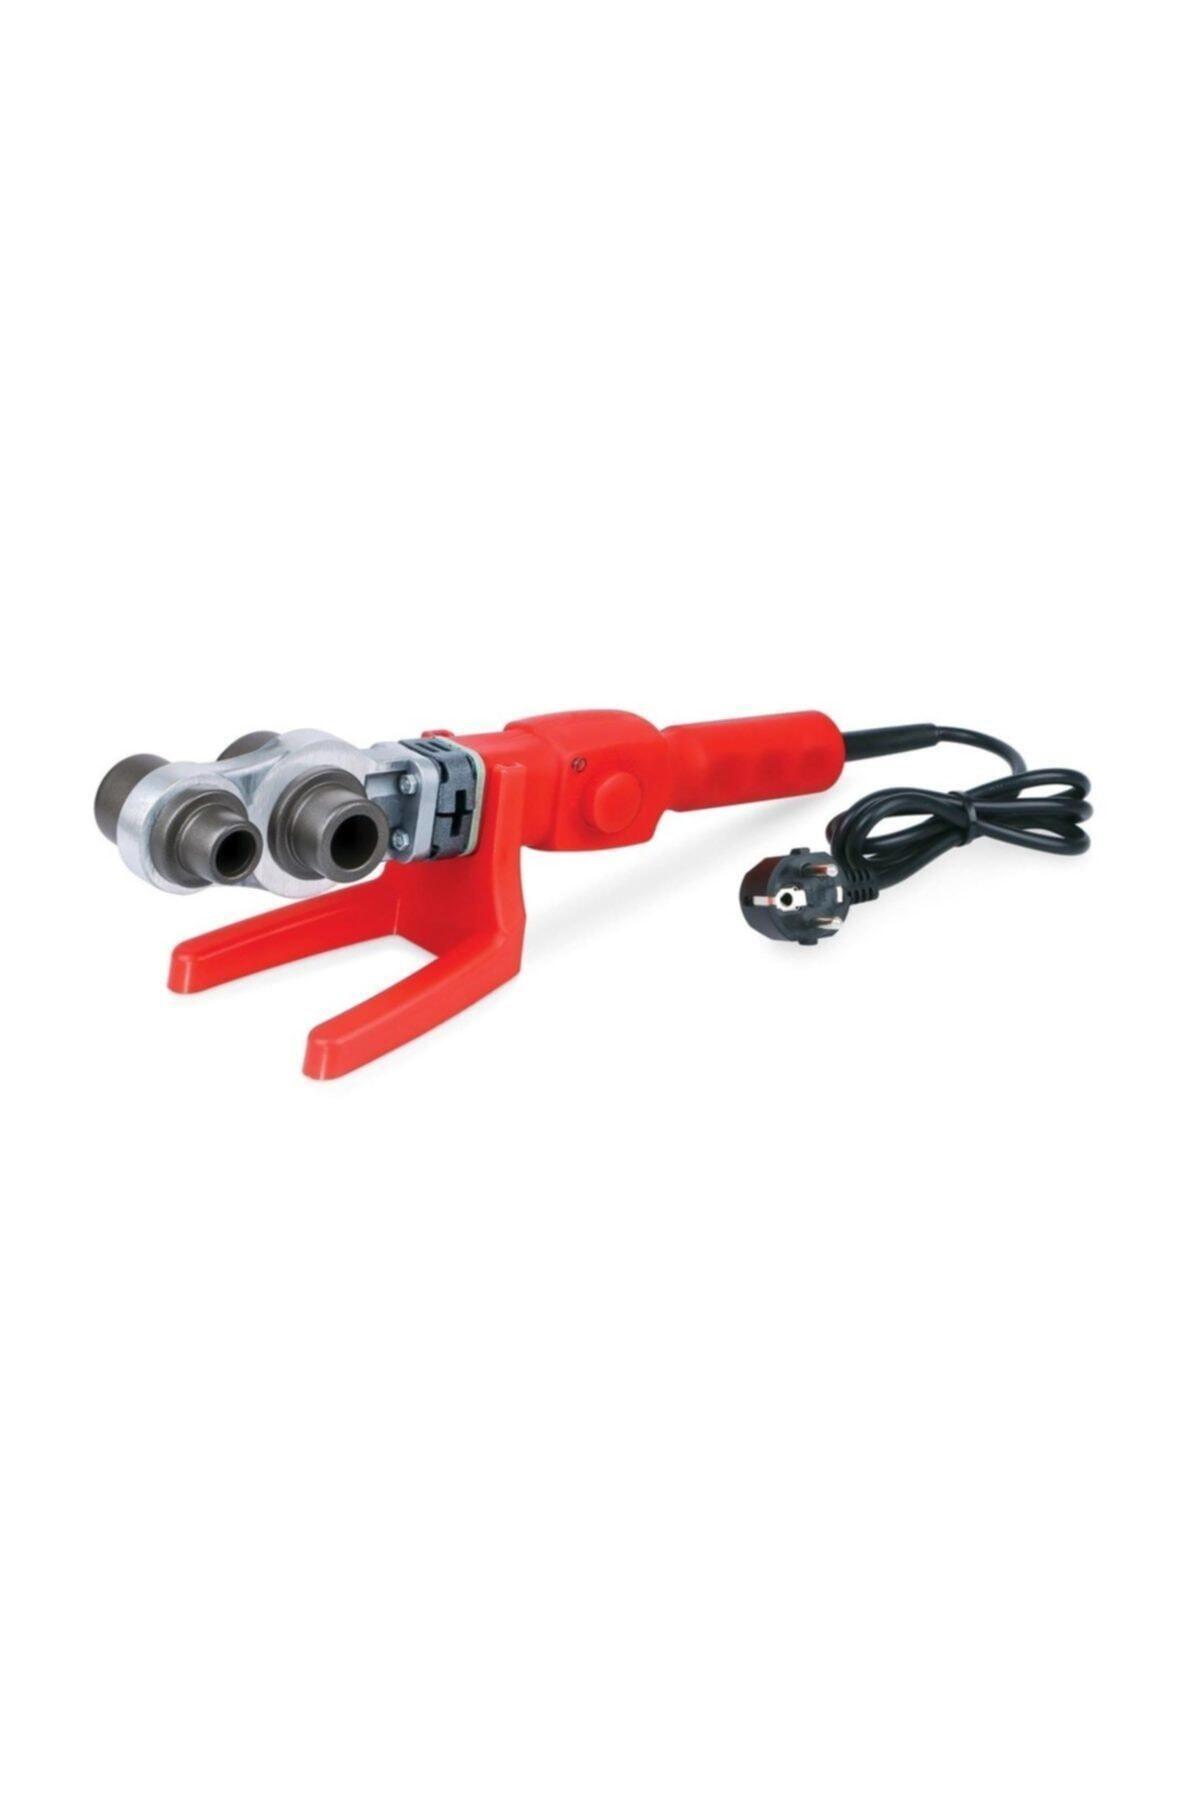 Sgs Smart Pprc Boru Kaynak Makine Seti 600 1